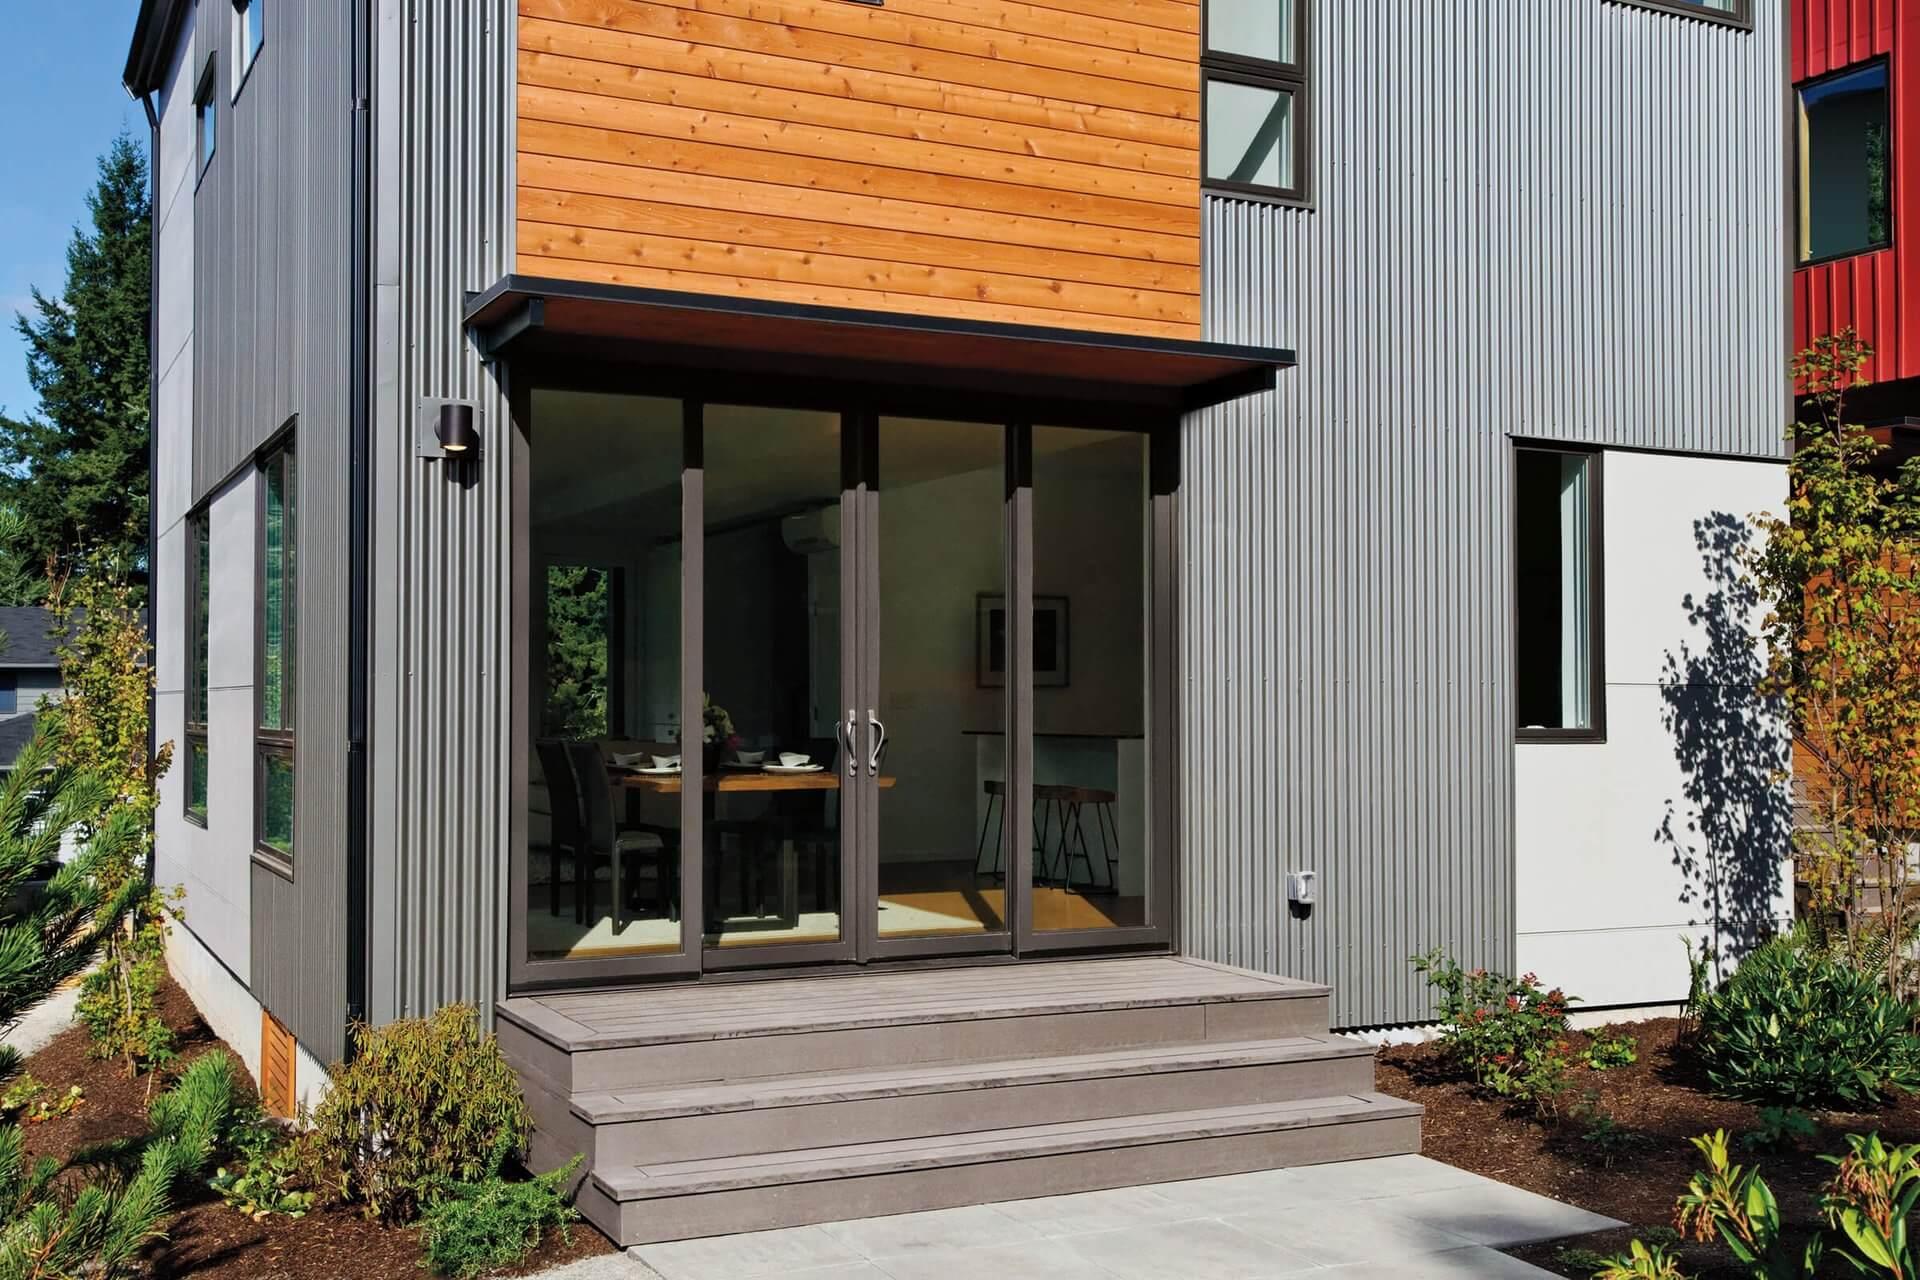 elevate-sliding-patio-door-2-grow_v2